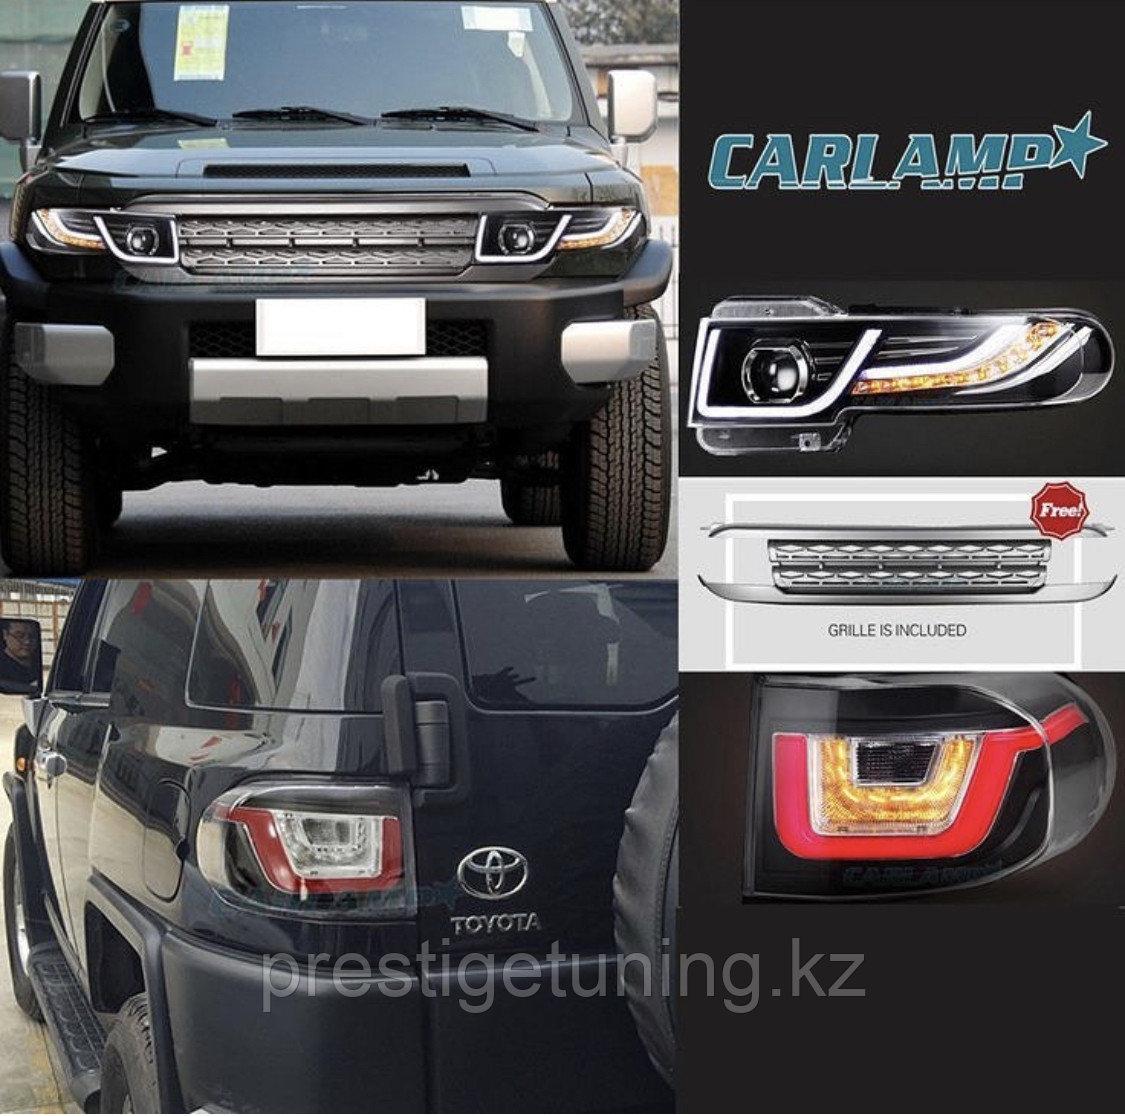 Комплект тюнинга на Toyota FJ Cruiser дизайн Range Rover